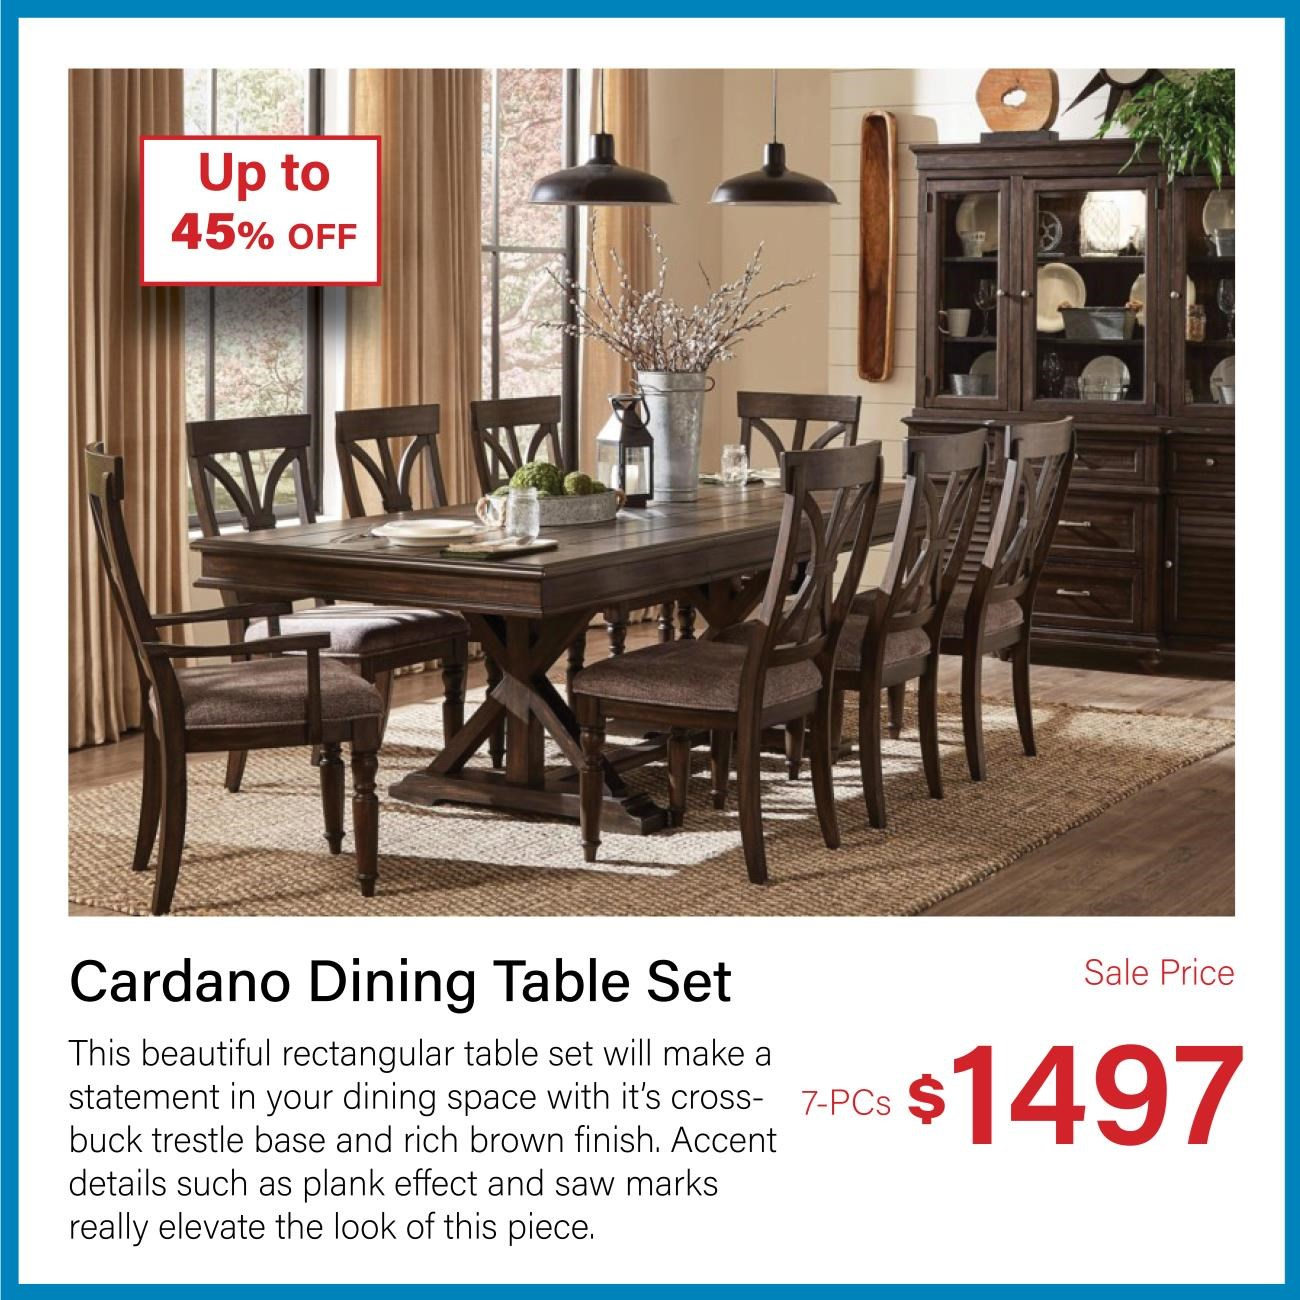 cardano 7-pc dining table set